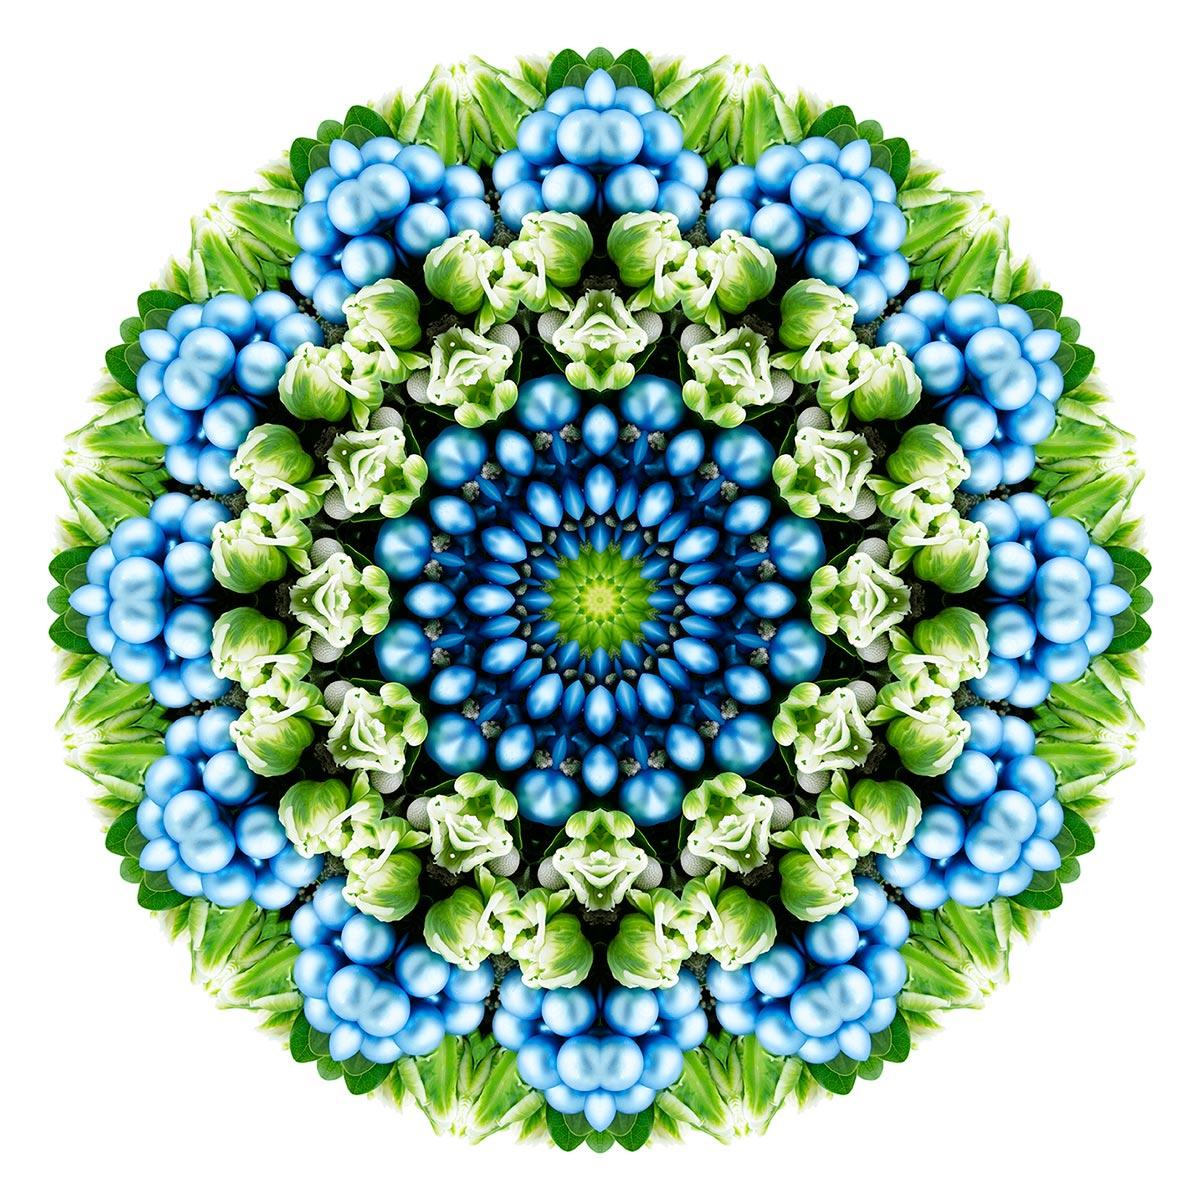 Flora Fractalis Sacred Geometry Javier Gomez Photography